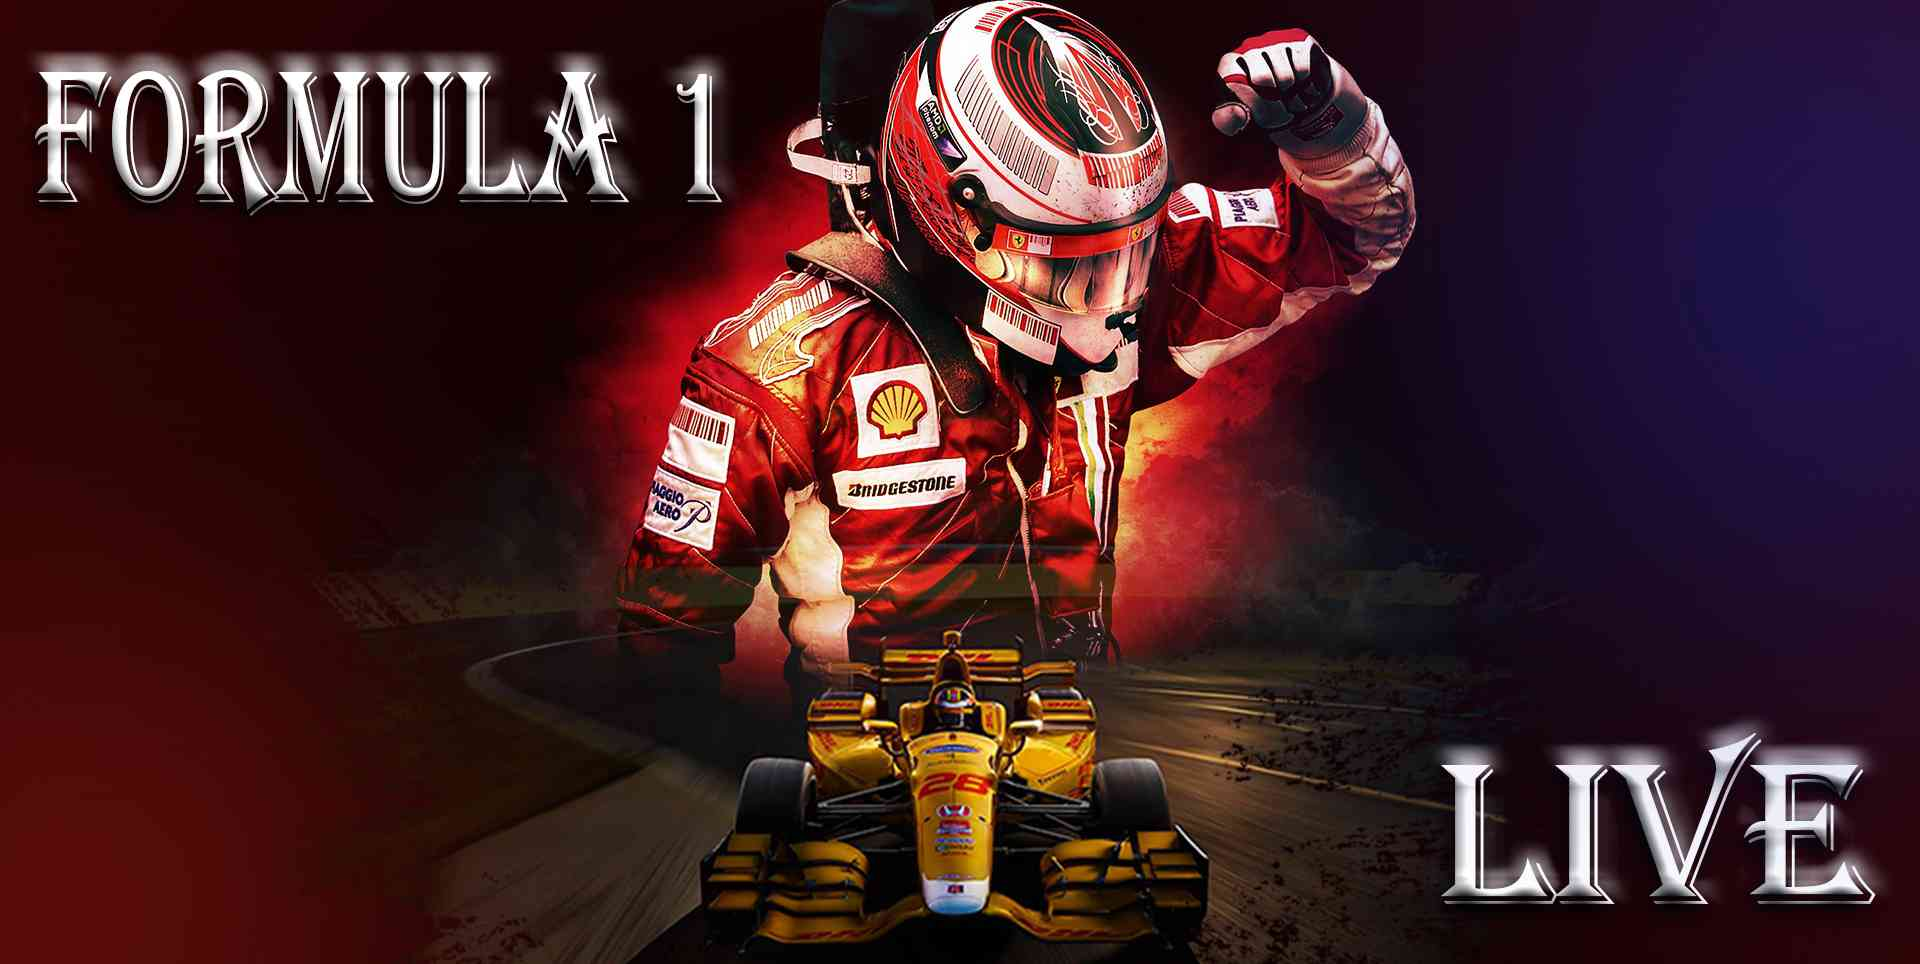 italian-rnd-2-formula-4-adria-2016-live